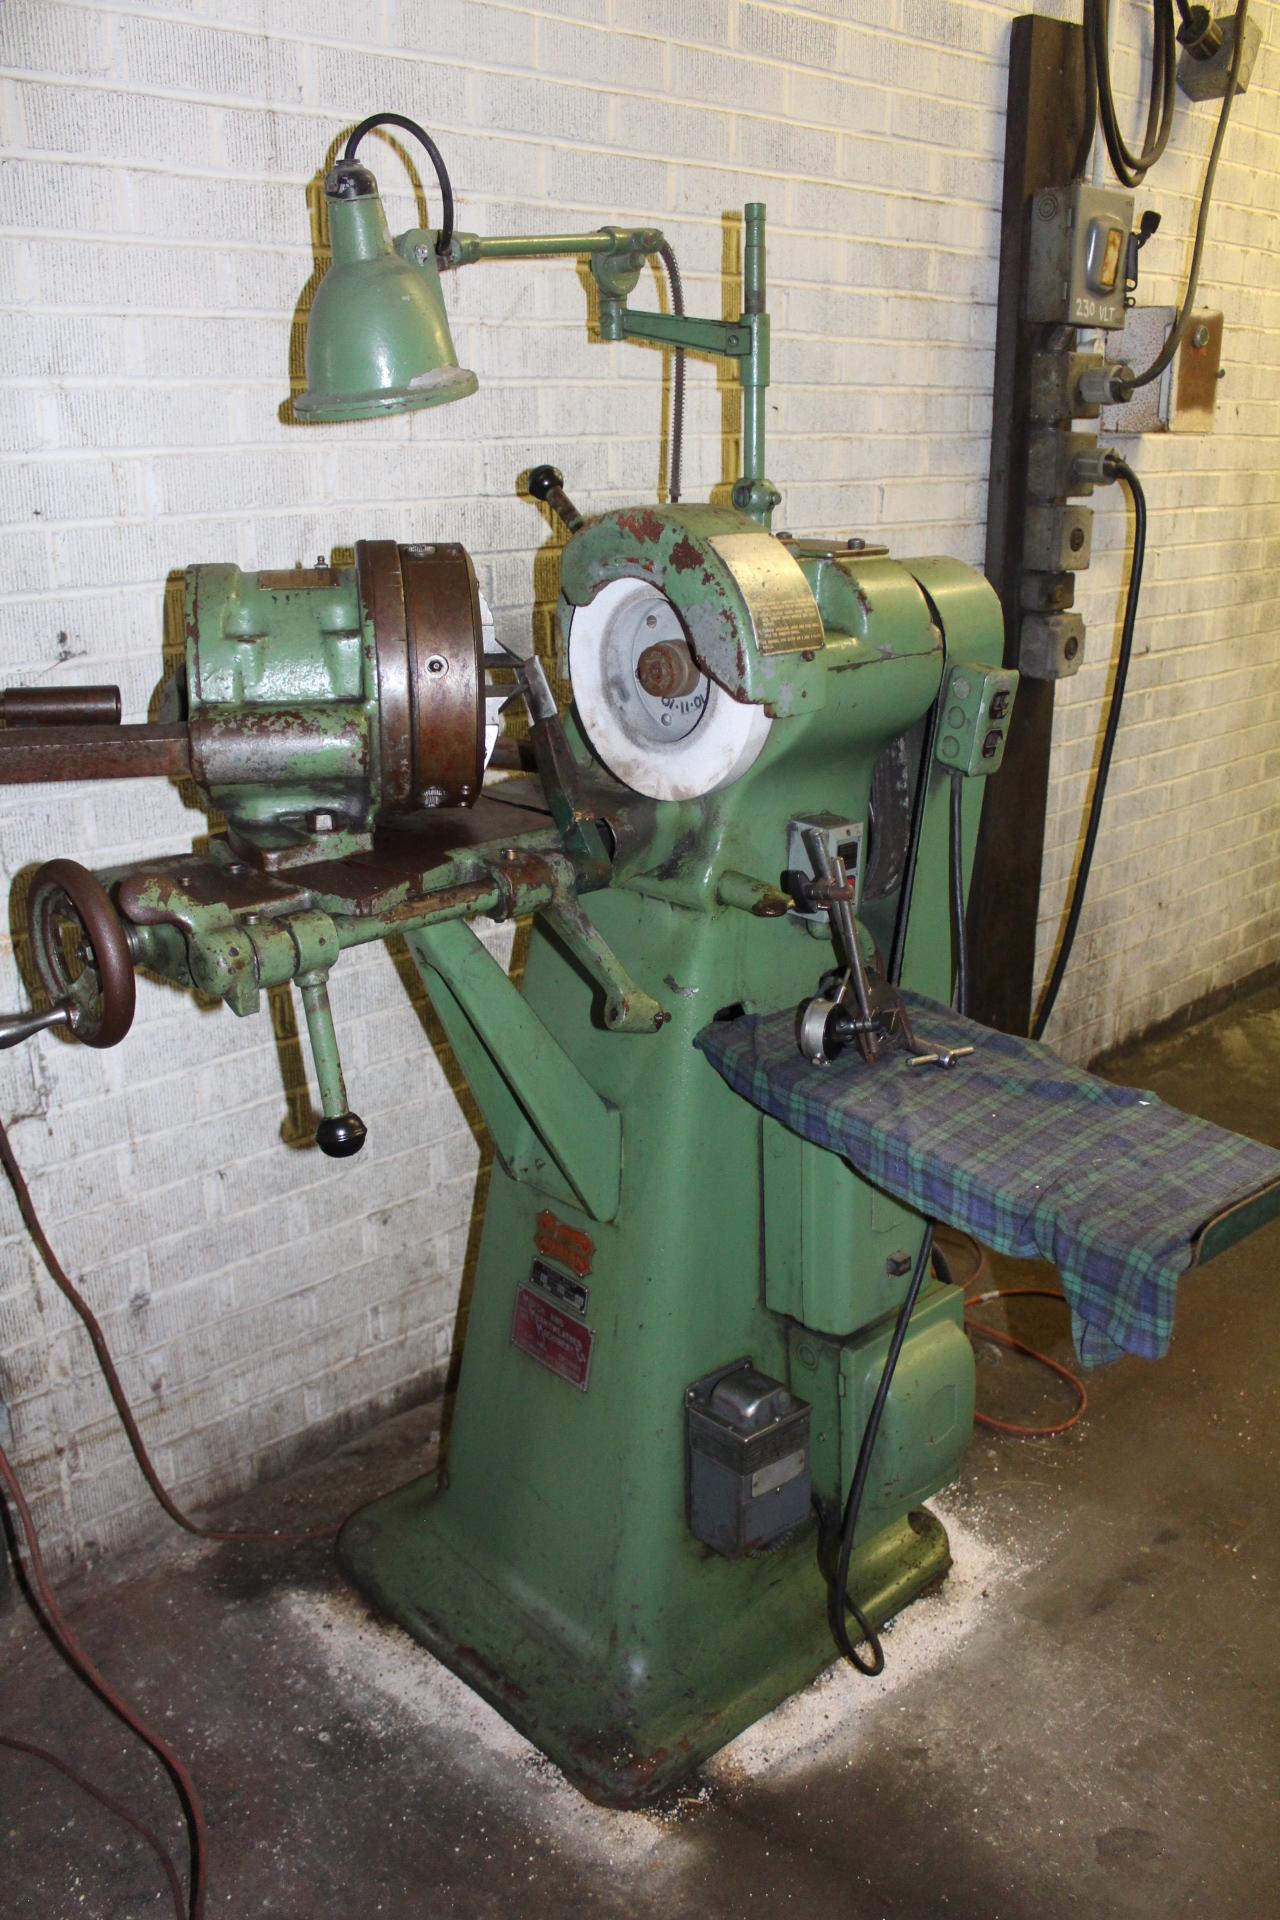 Lot 55 - Oliver No. 600 Drill Point Grinder